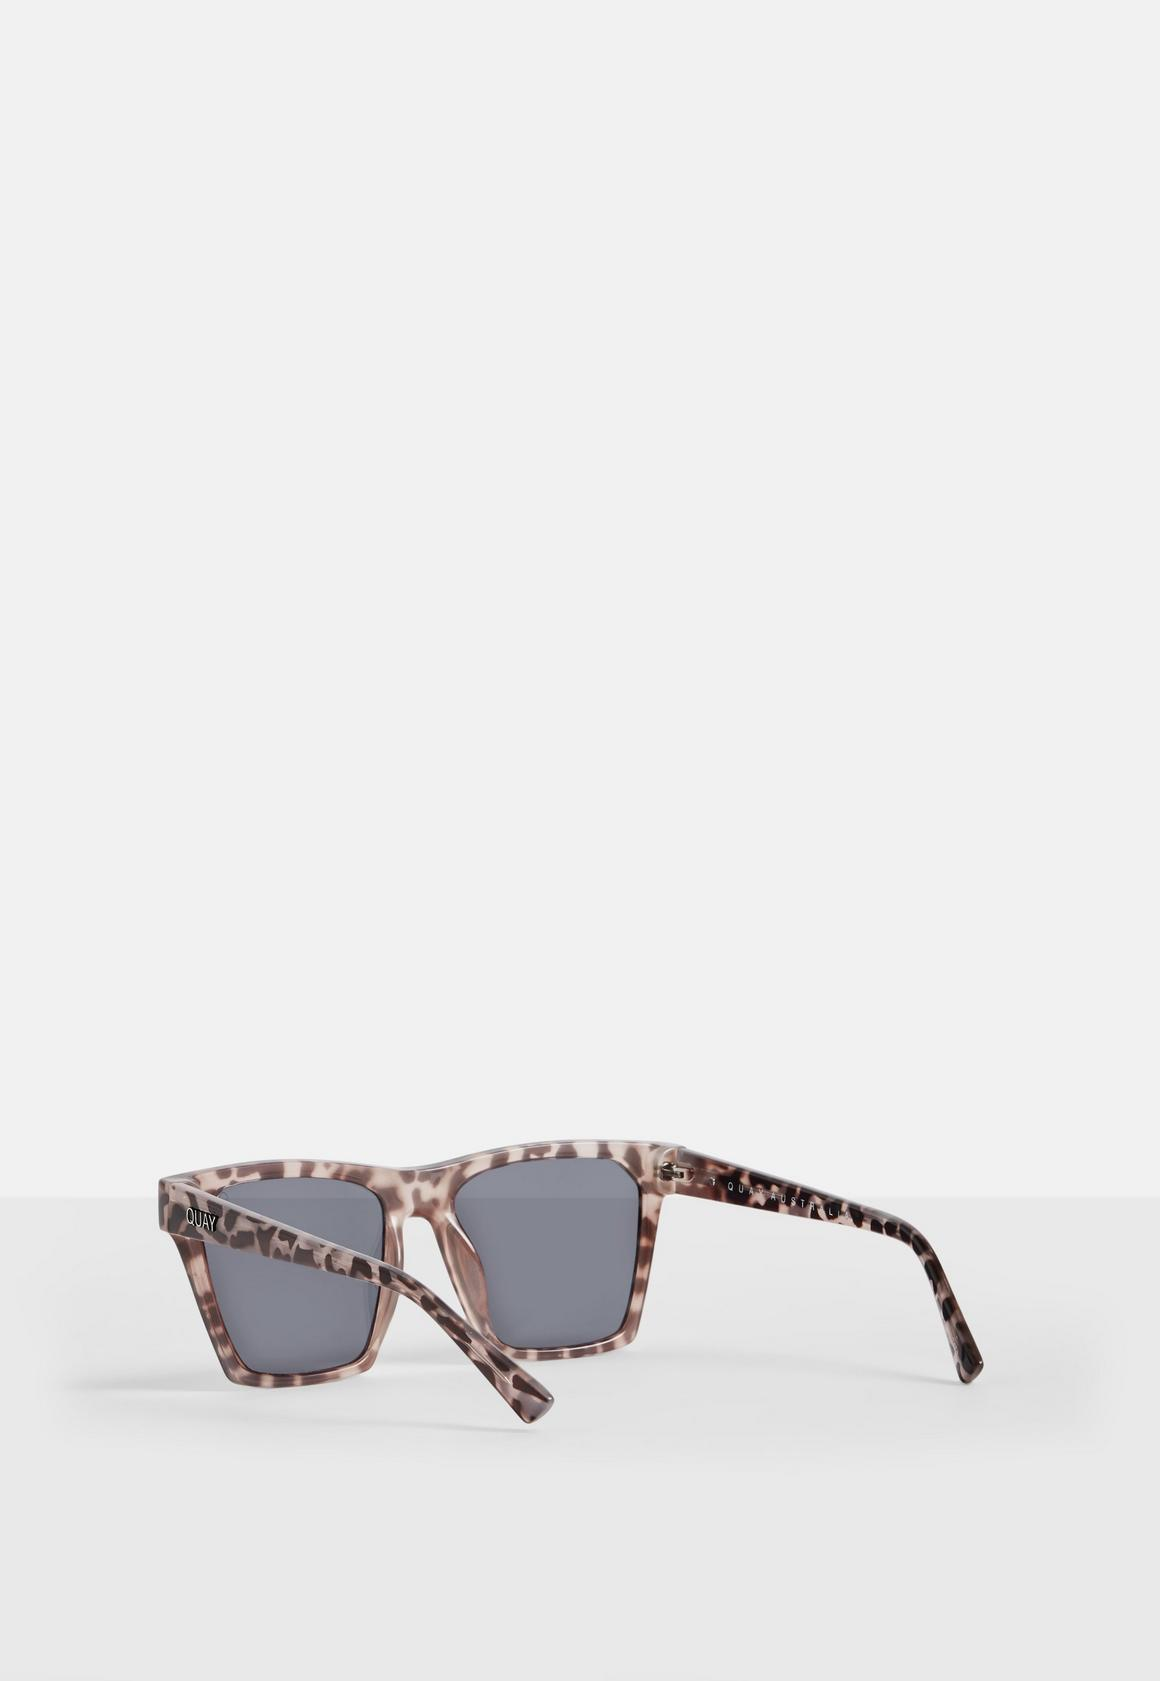 9c3469ff8c Missguided - Quay Australia x Missguided Tortoise Gold Revo Gold Alright  Sunglasses